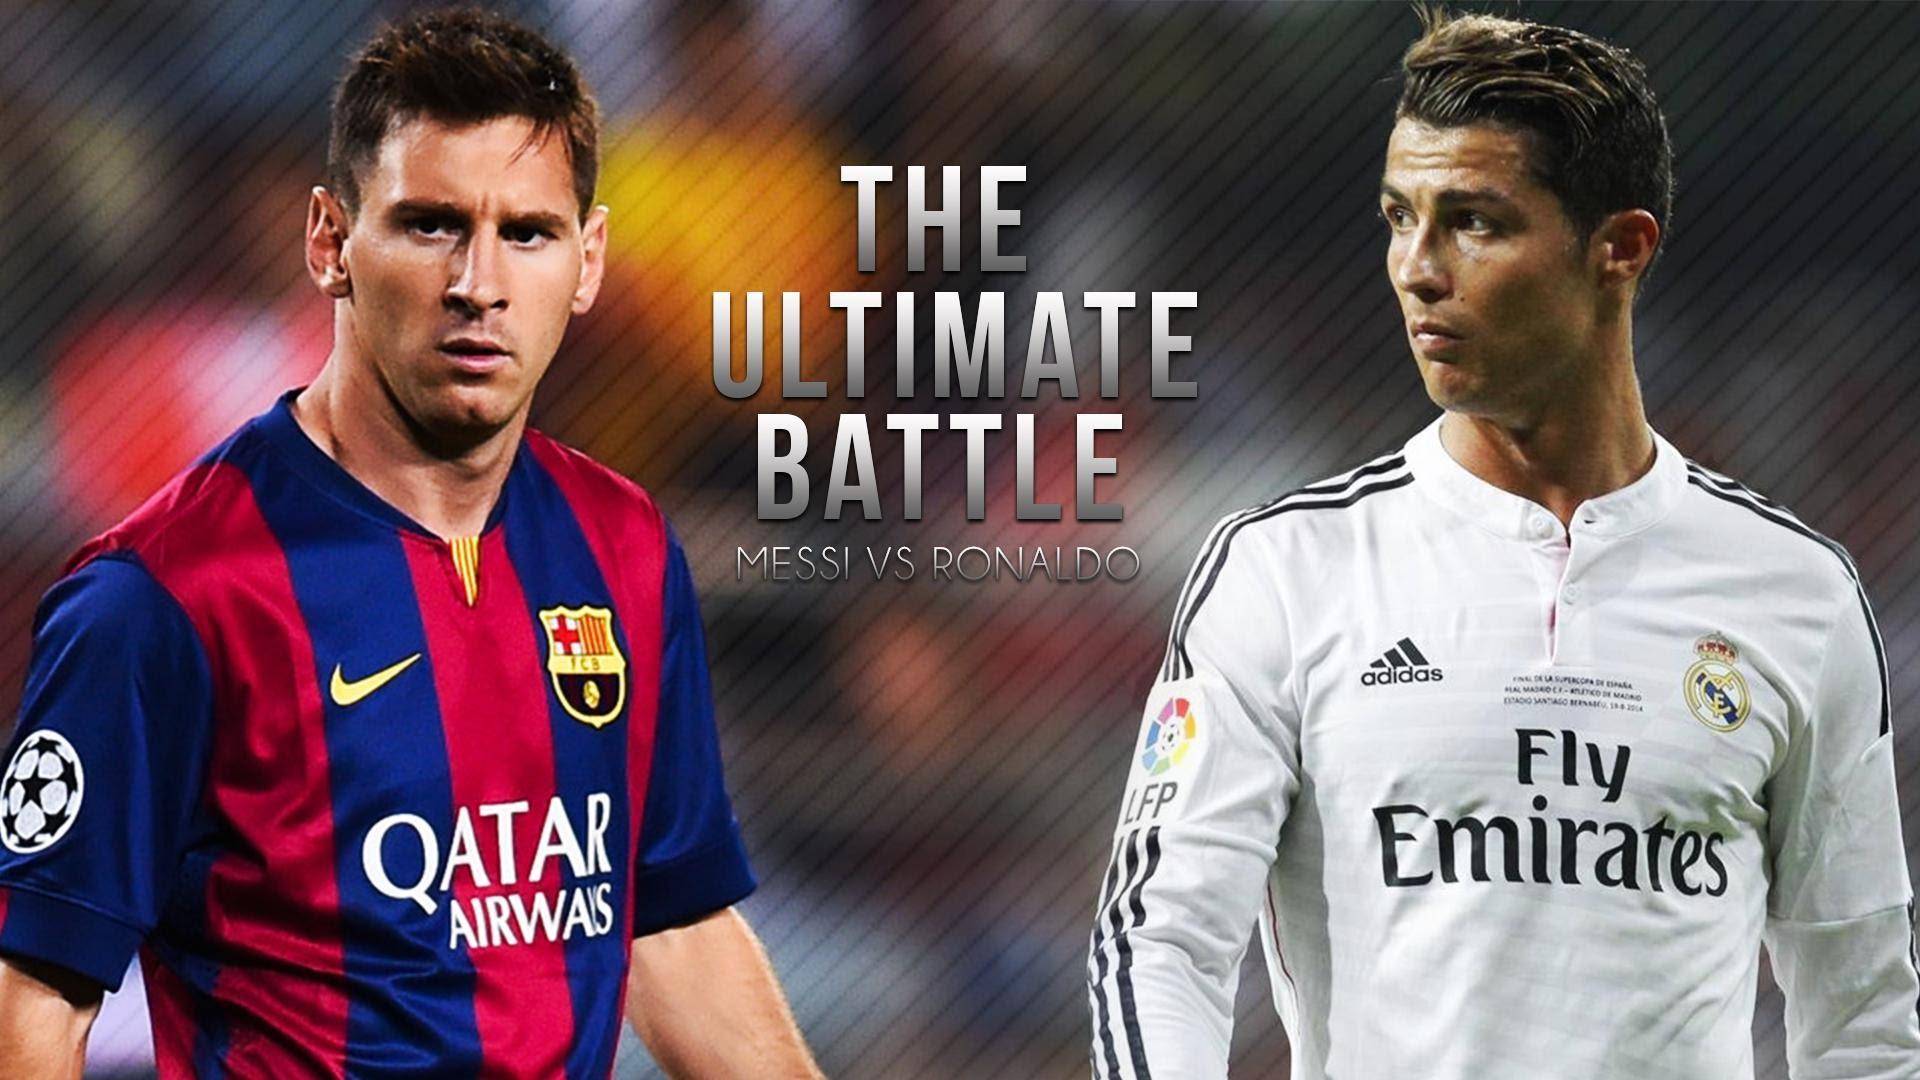 Messi and Ronaldo Need Each Other - Carlo Ancelotti